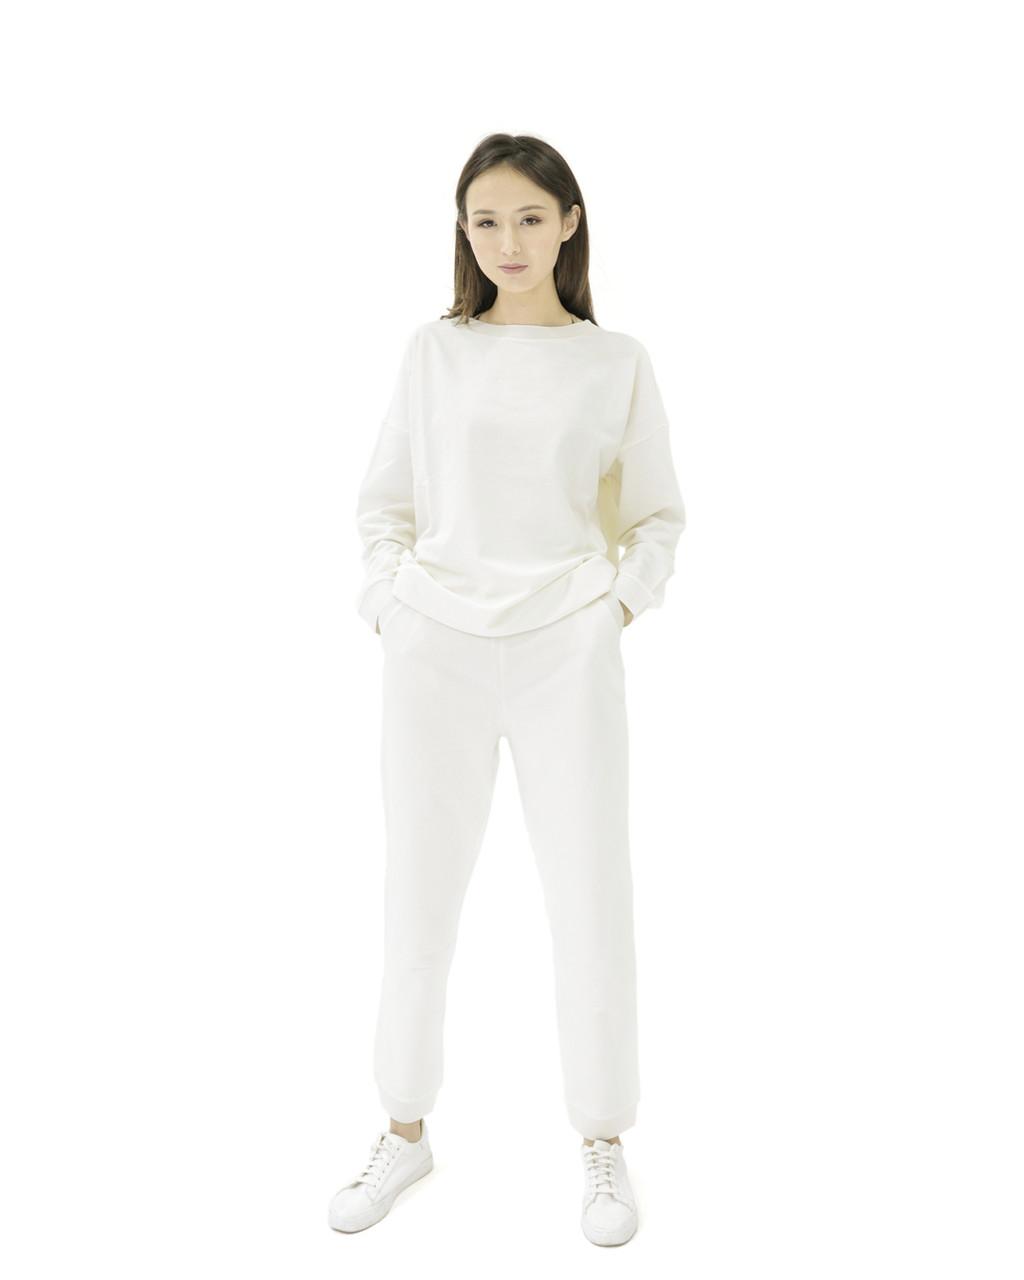 Женский костюм белый (sport collection 2021)